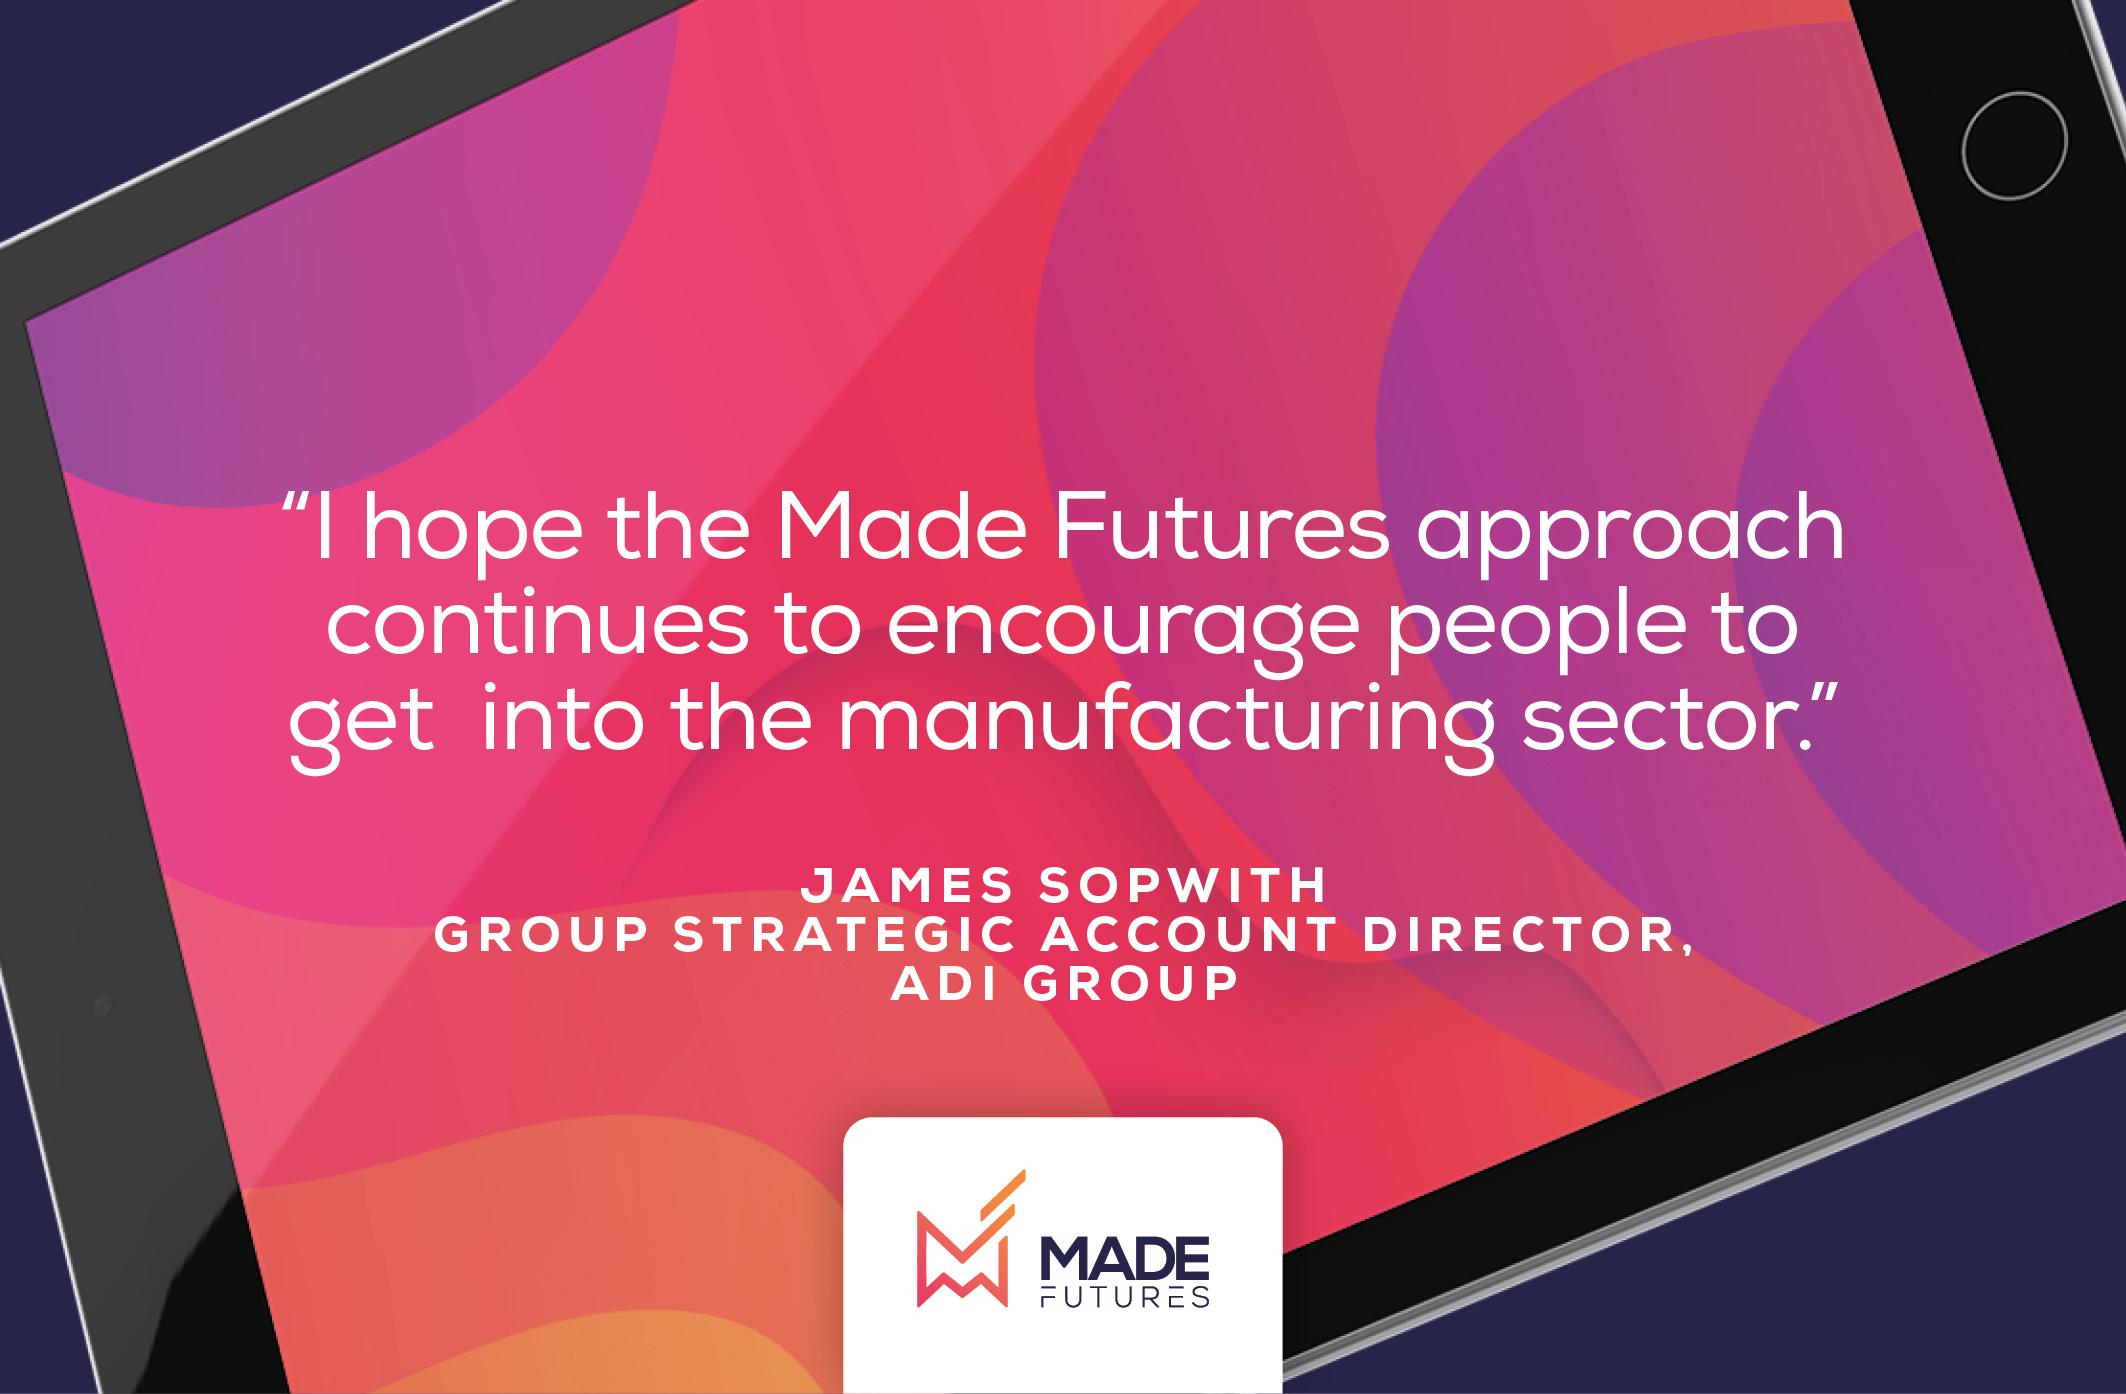 Testimonial by James Sopwith, Group strategic account director at ADI Group